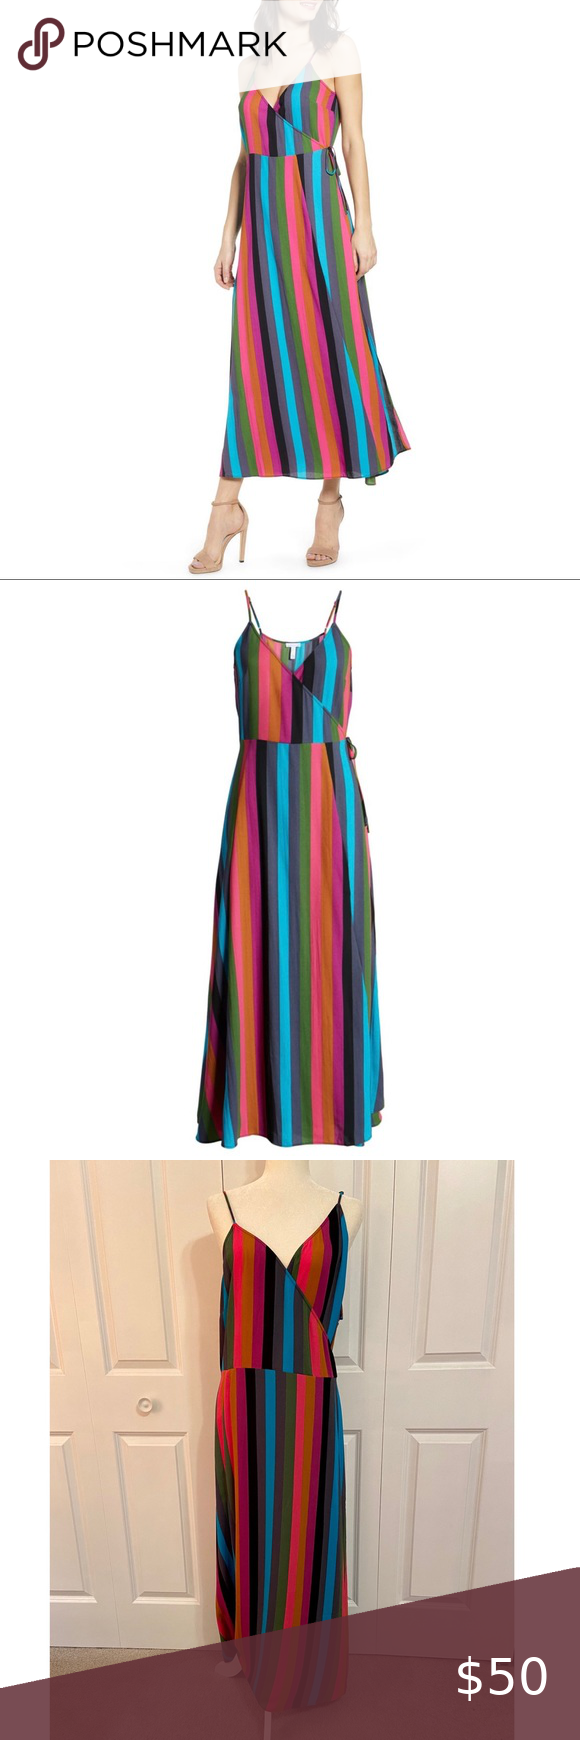 Nordstrom Leith Striped Maxi Wrap Dress 4x New Size 4x 26 28 True Wrap Dress Maxi Length Surplice V Neckline Adjustable S Maxi Wrap Dress Wrap Dress Dresses [ 1740 x 580 Pixel ]